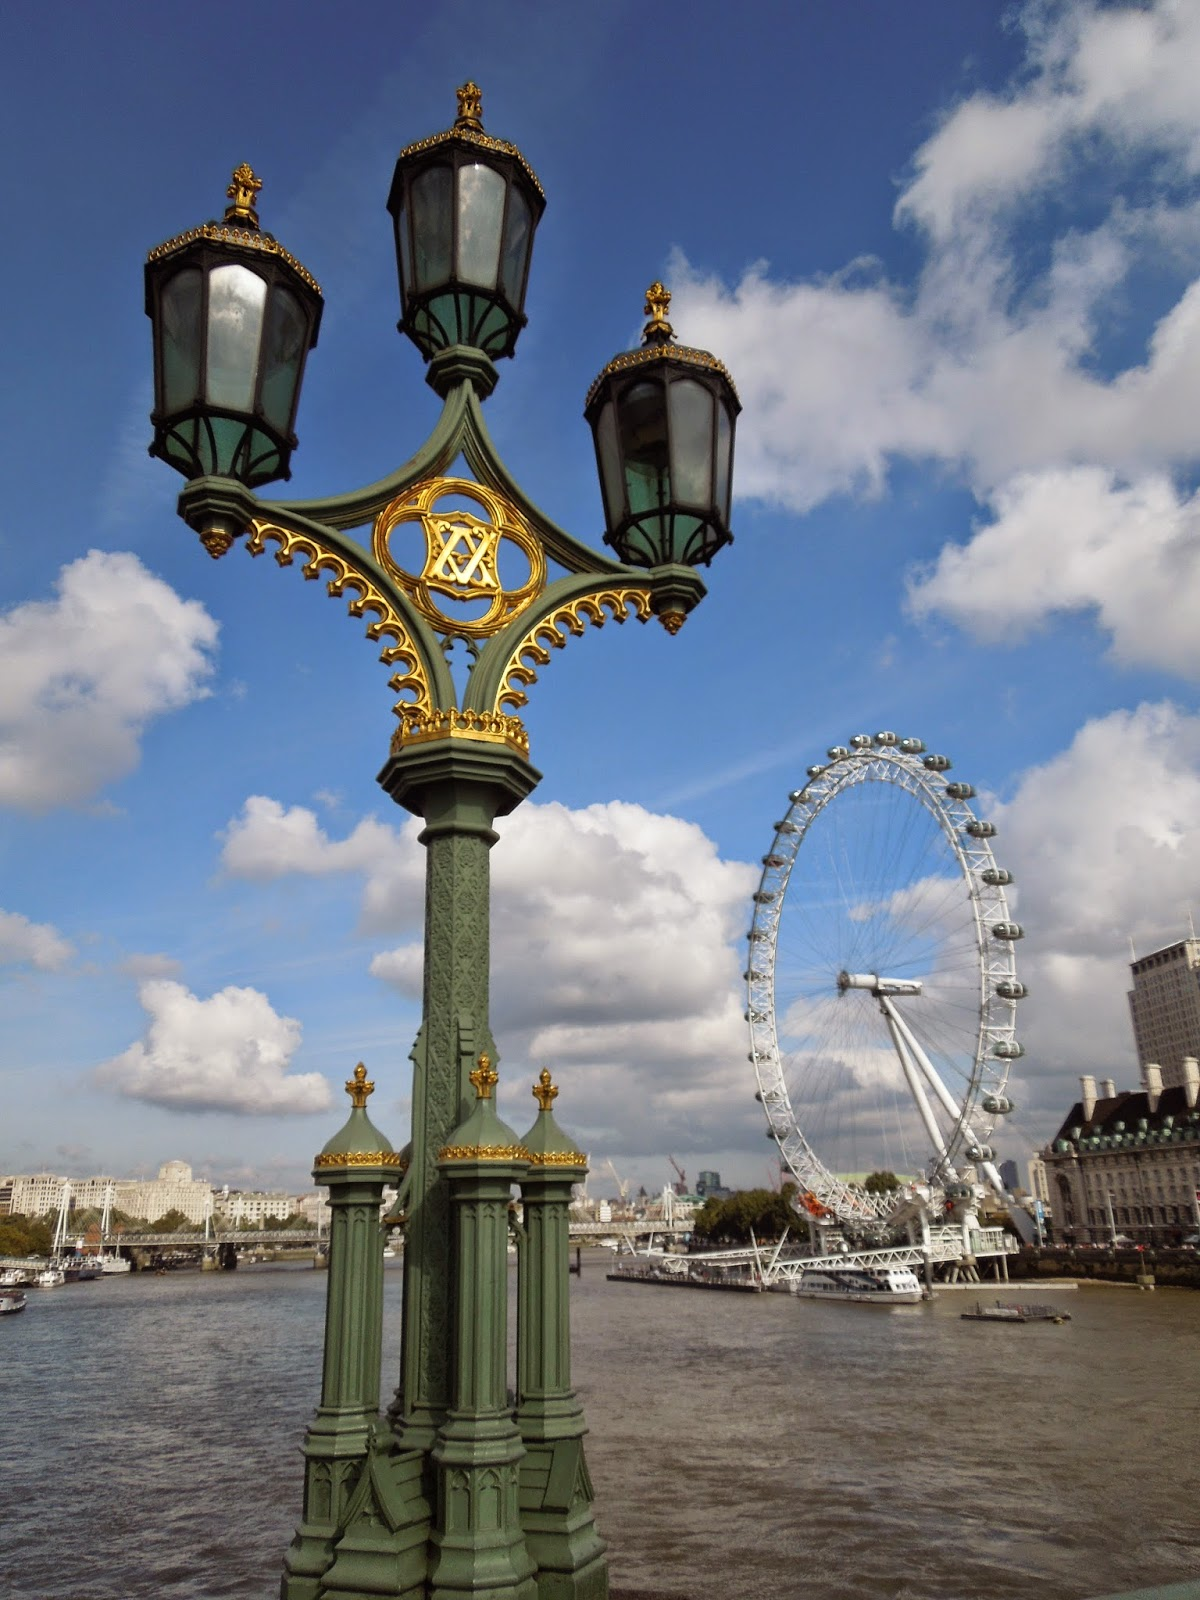 the London Eye from Westminster Bridge